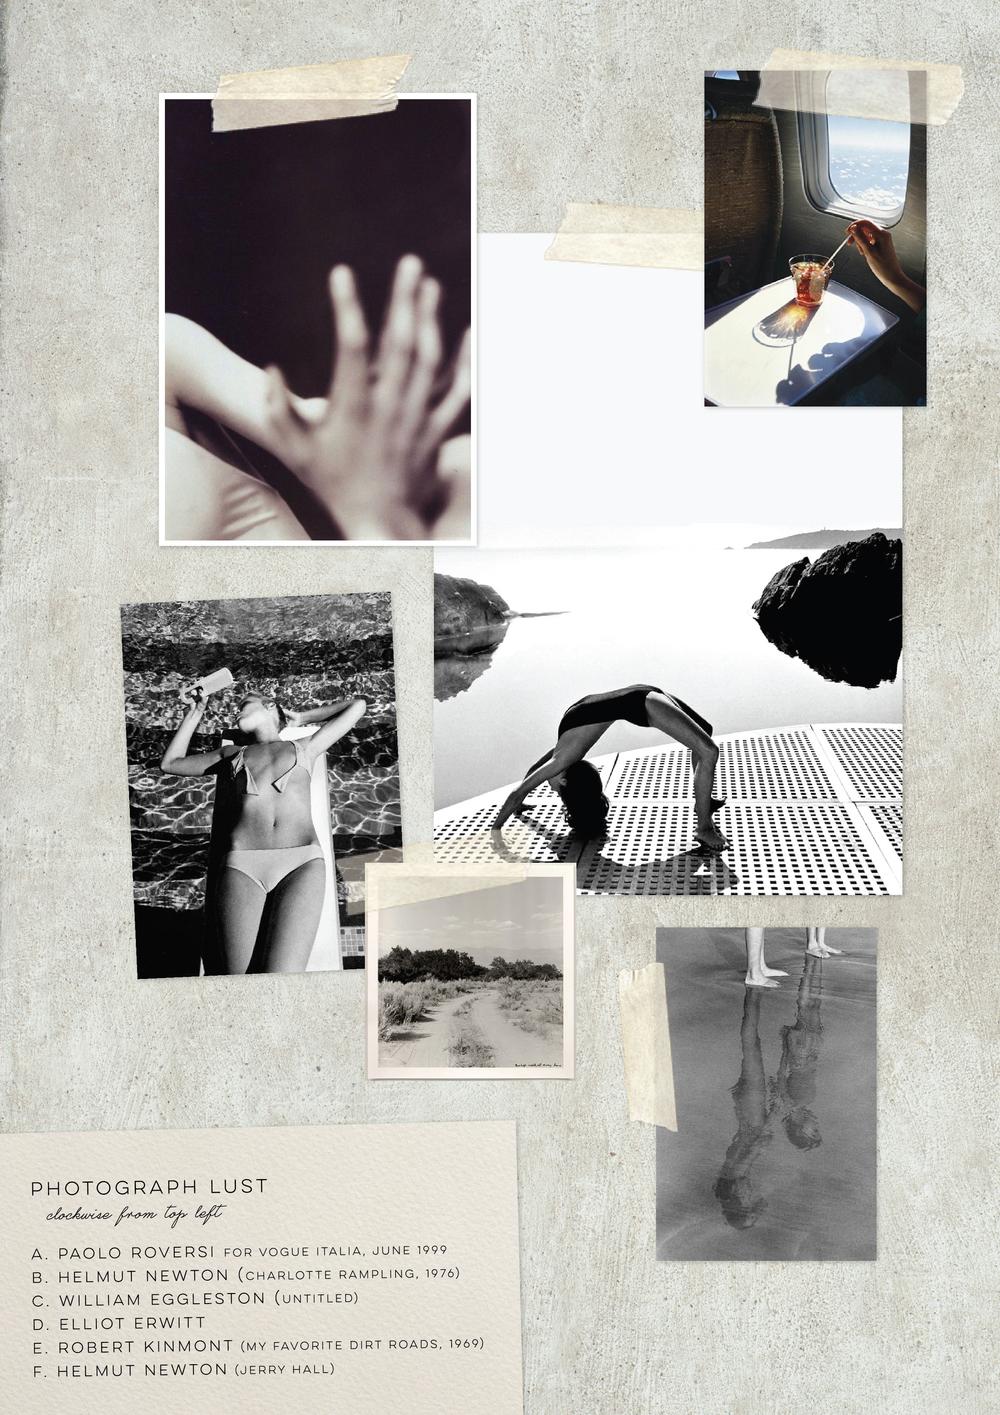 Photograph-lust